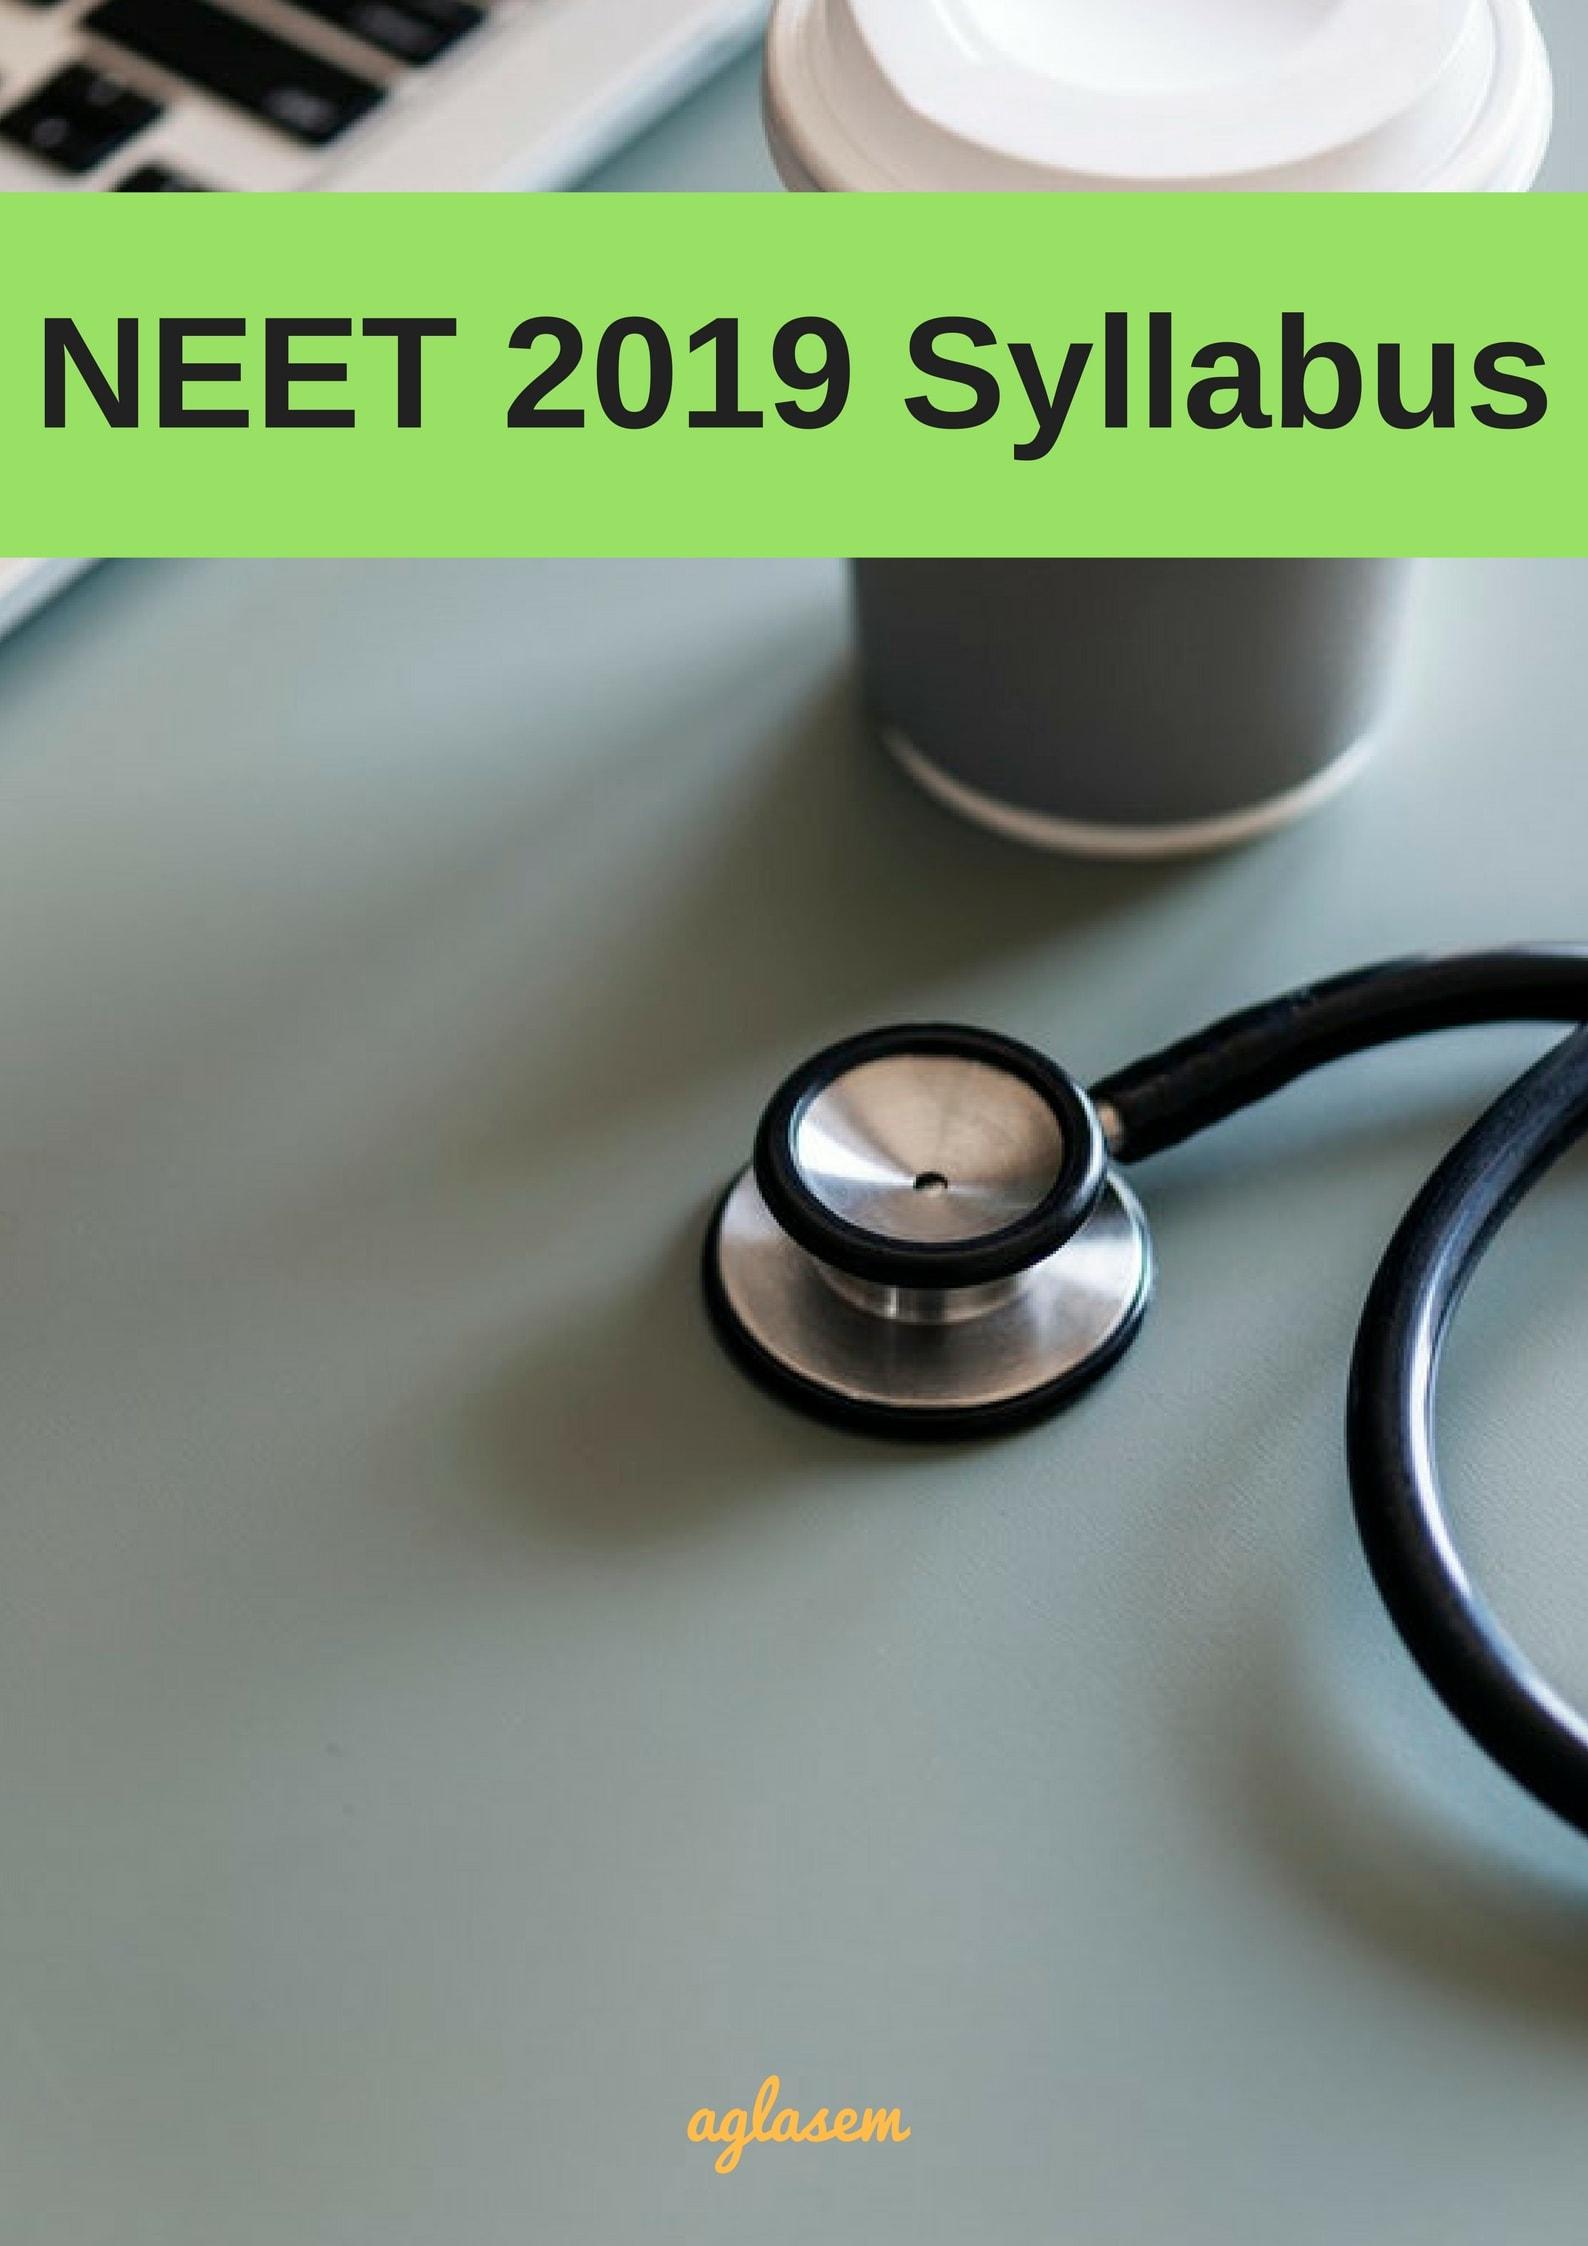 NEET 2019 Syllabus (Physics, Chemistry, Biology)   Get Complete NEET Syllabus